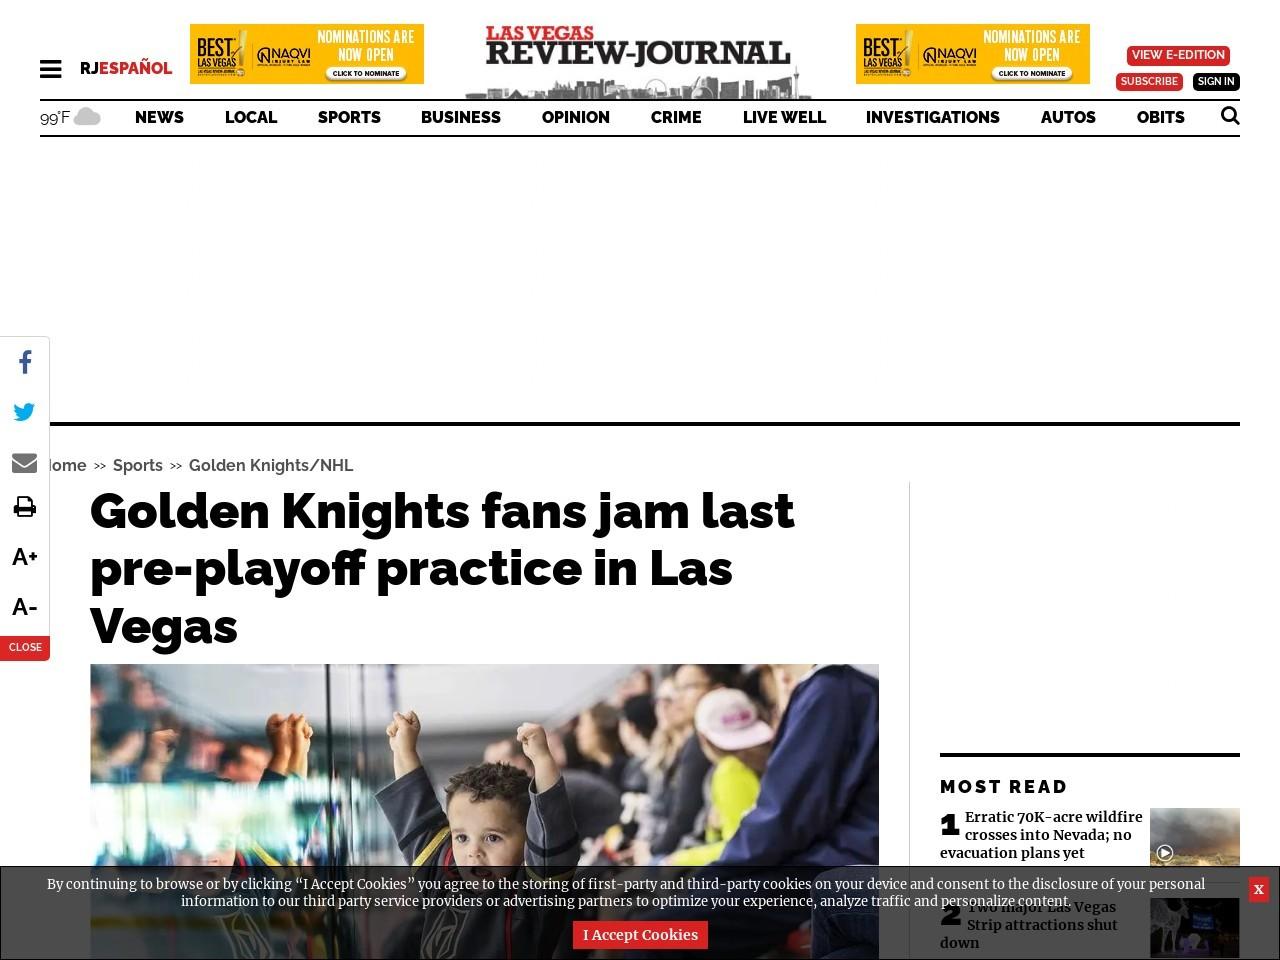 Golden Knights fans jam last pre-playoff practice in Las Vegas